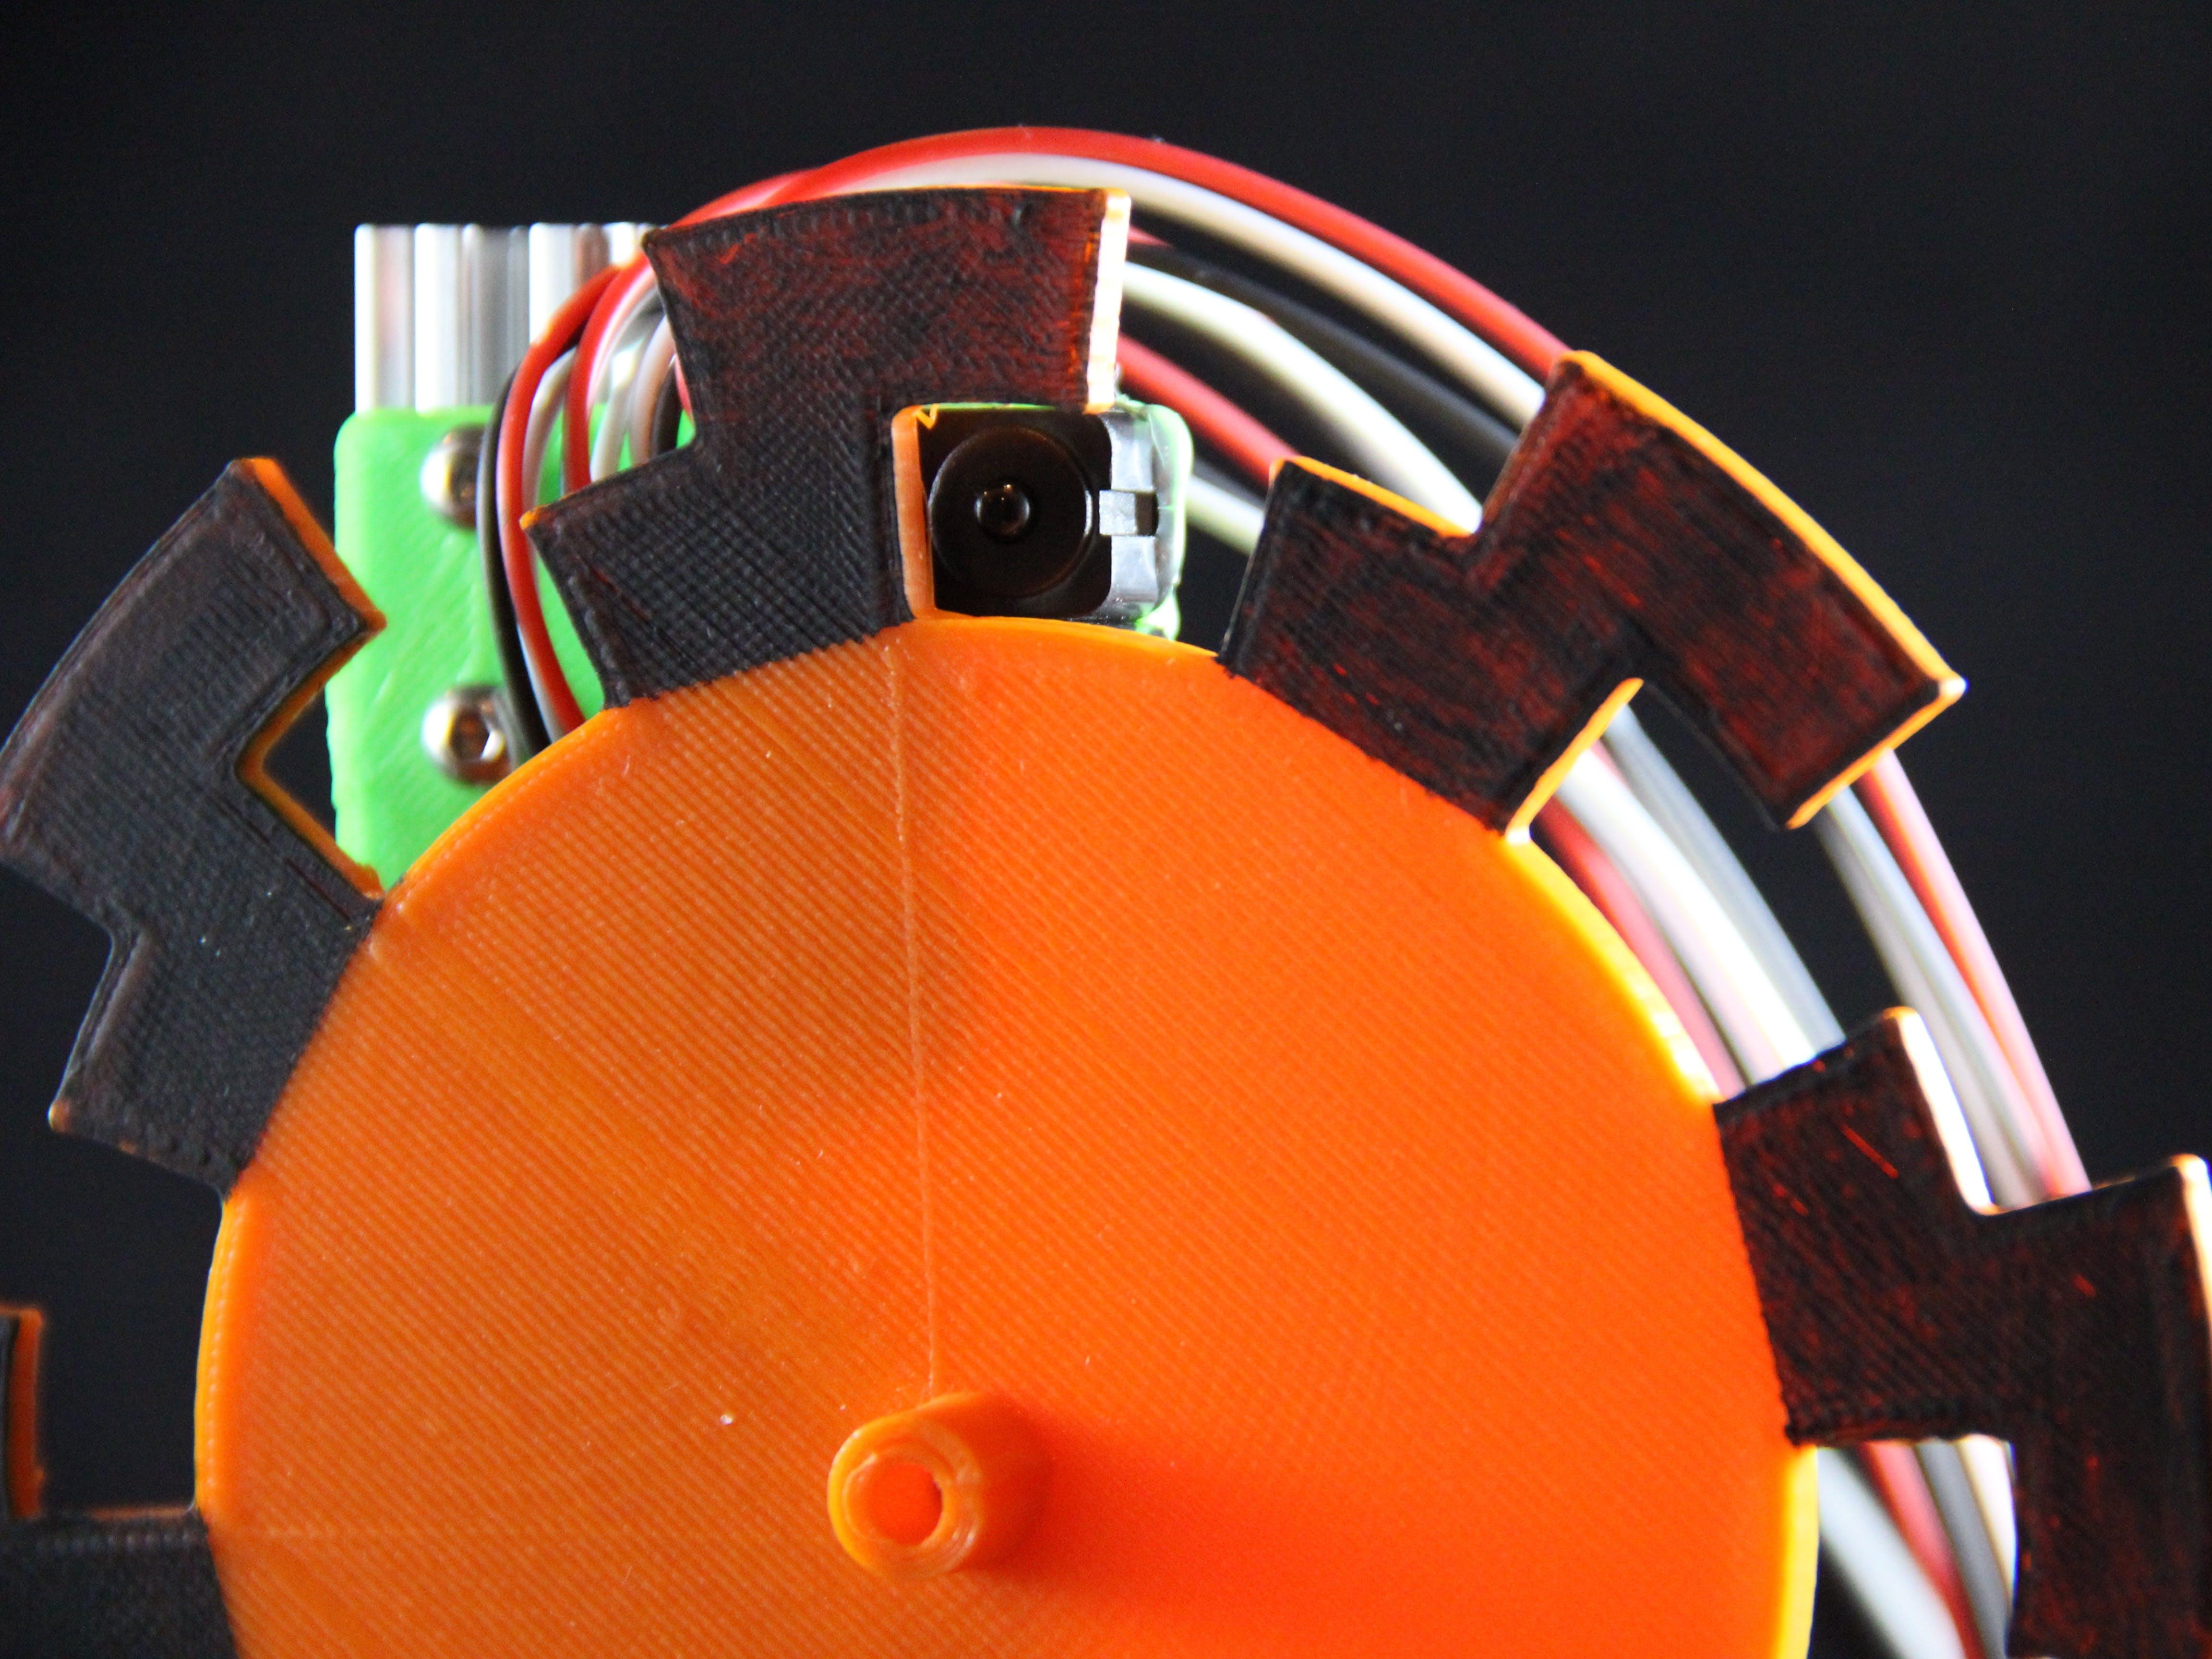 Exploring Encoders - Step Trackers for Motors